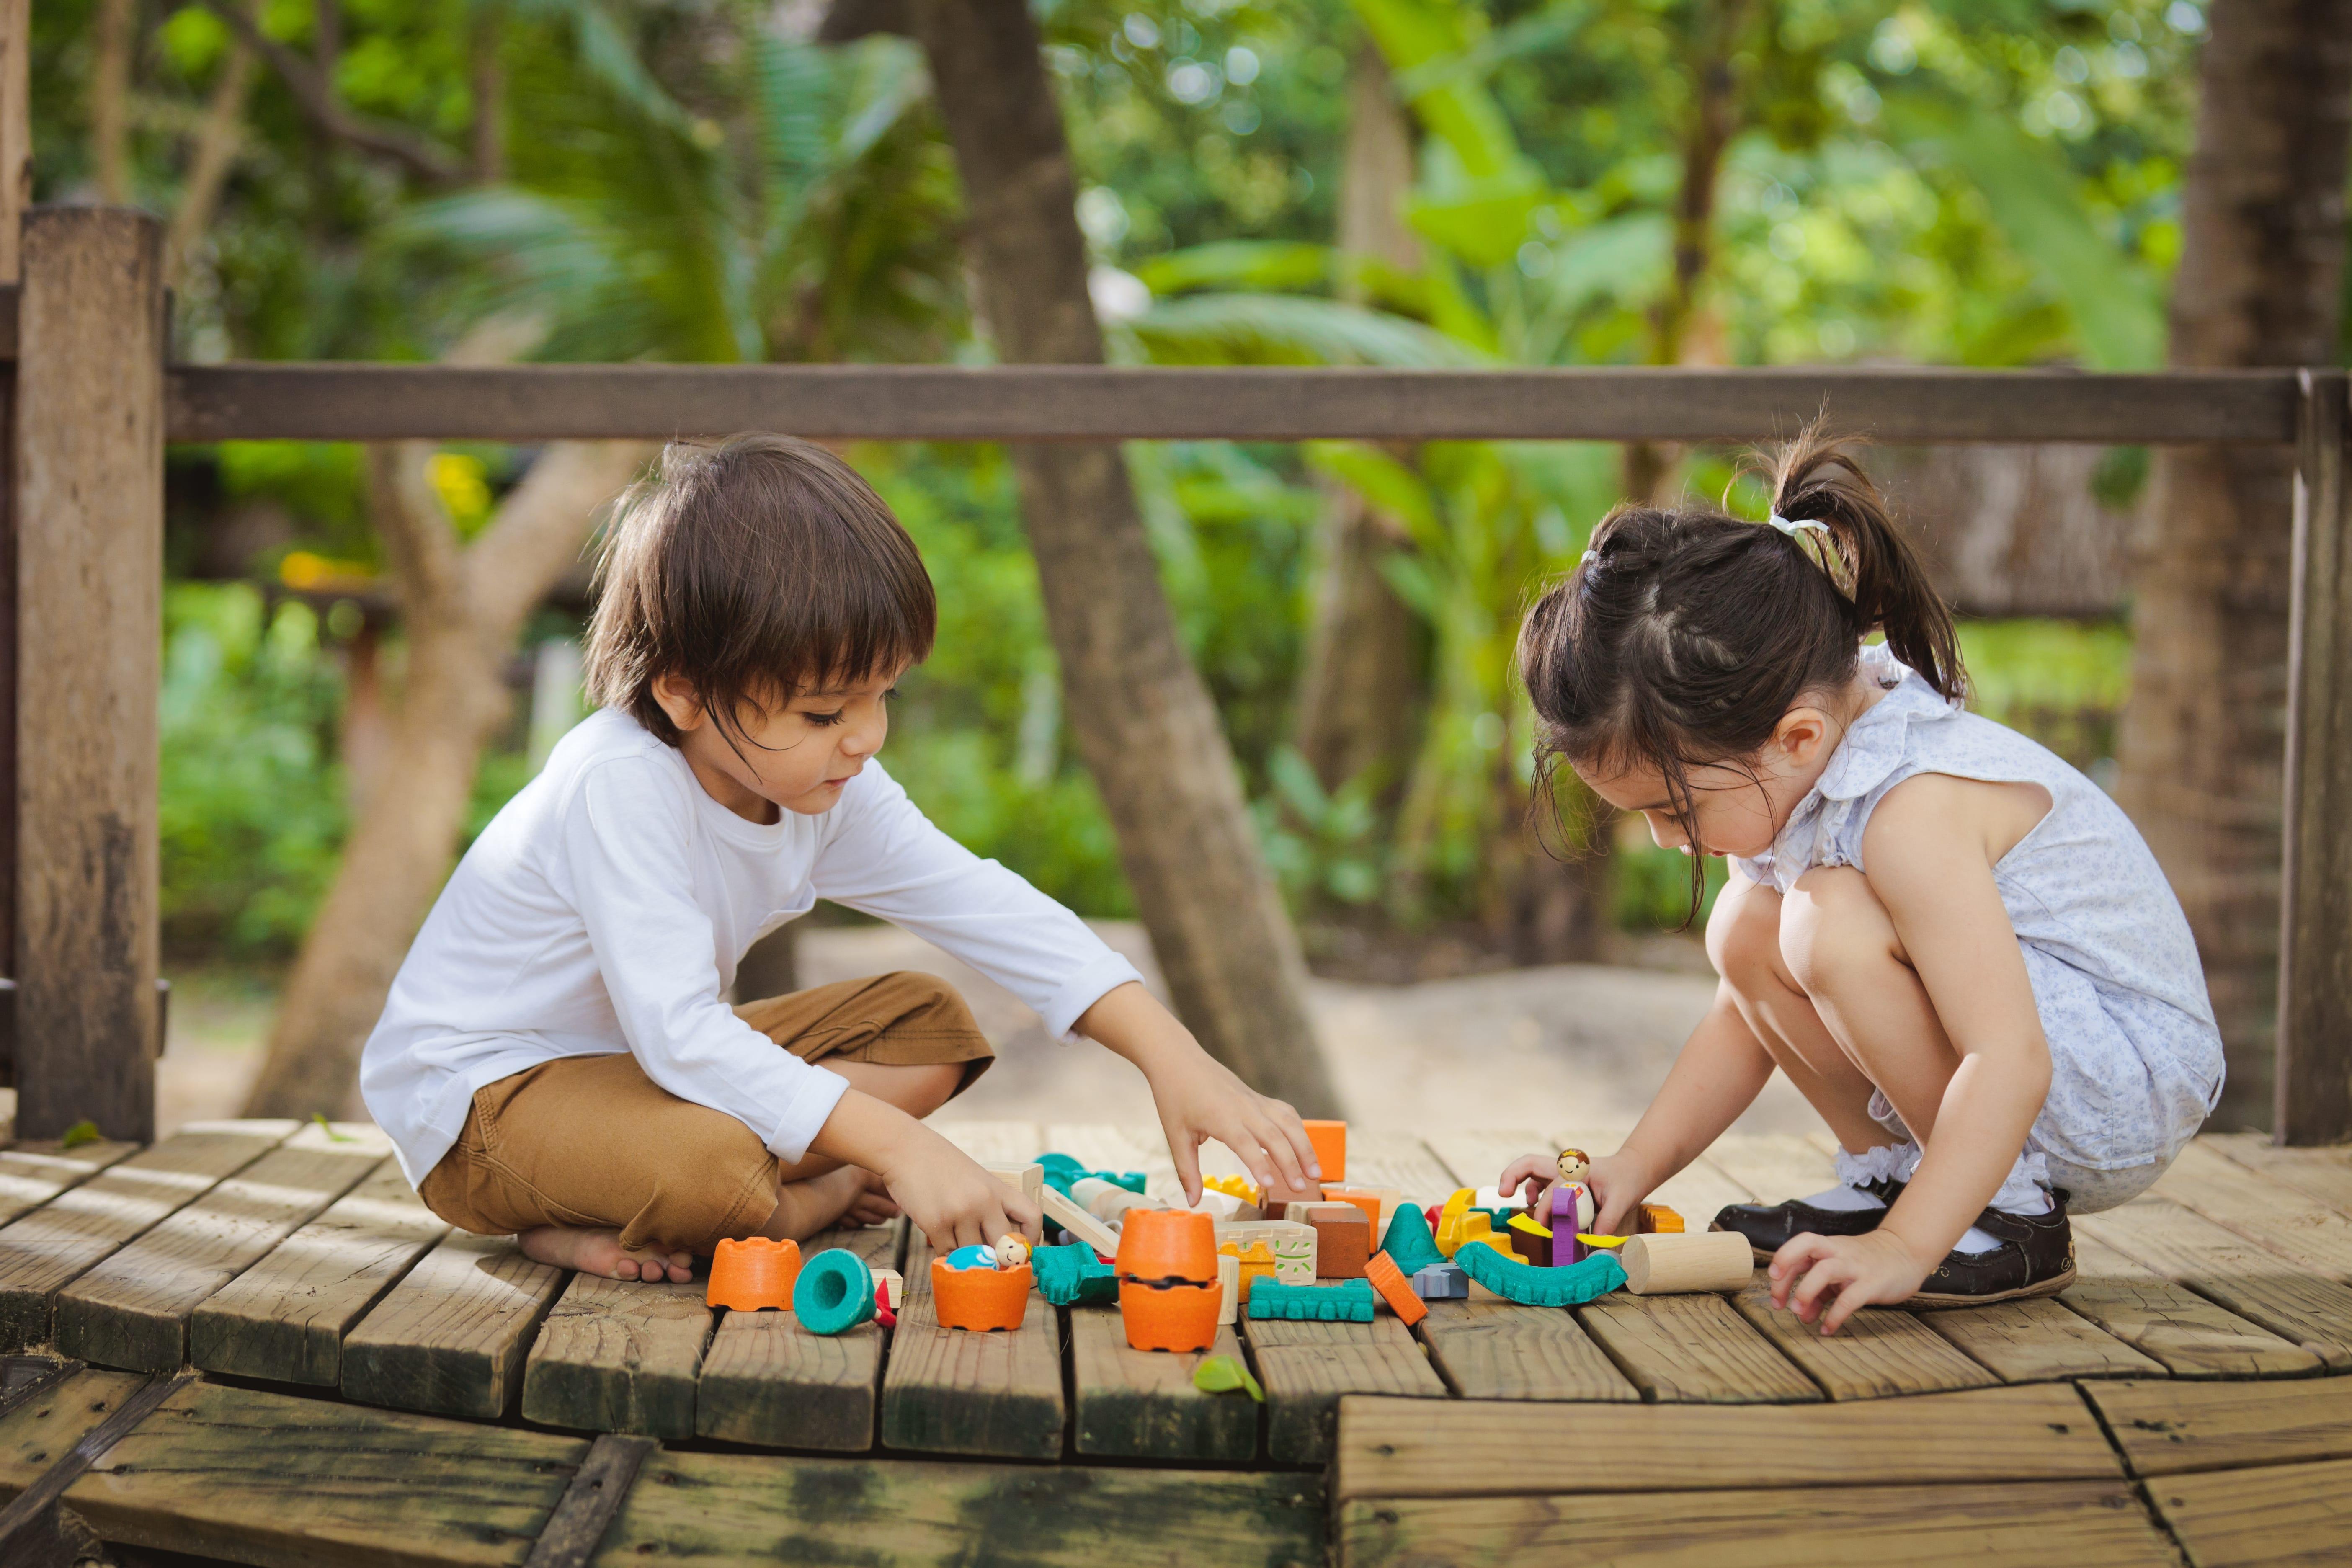 5696_PlanToys_FANTASY_BLOCKS_Blocks_and_Construction_Fine_Motor_Coordination_Creative_Tactile_3yrs_Wooden_toys_Education_toys_Safety_Toys_Non-toxic_2.jpg